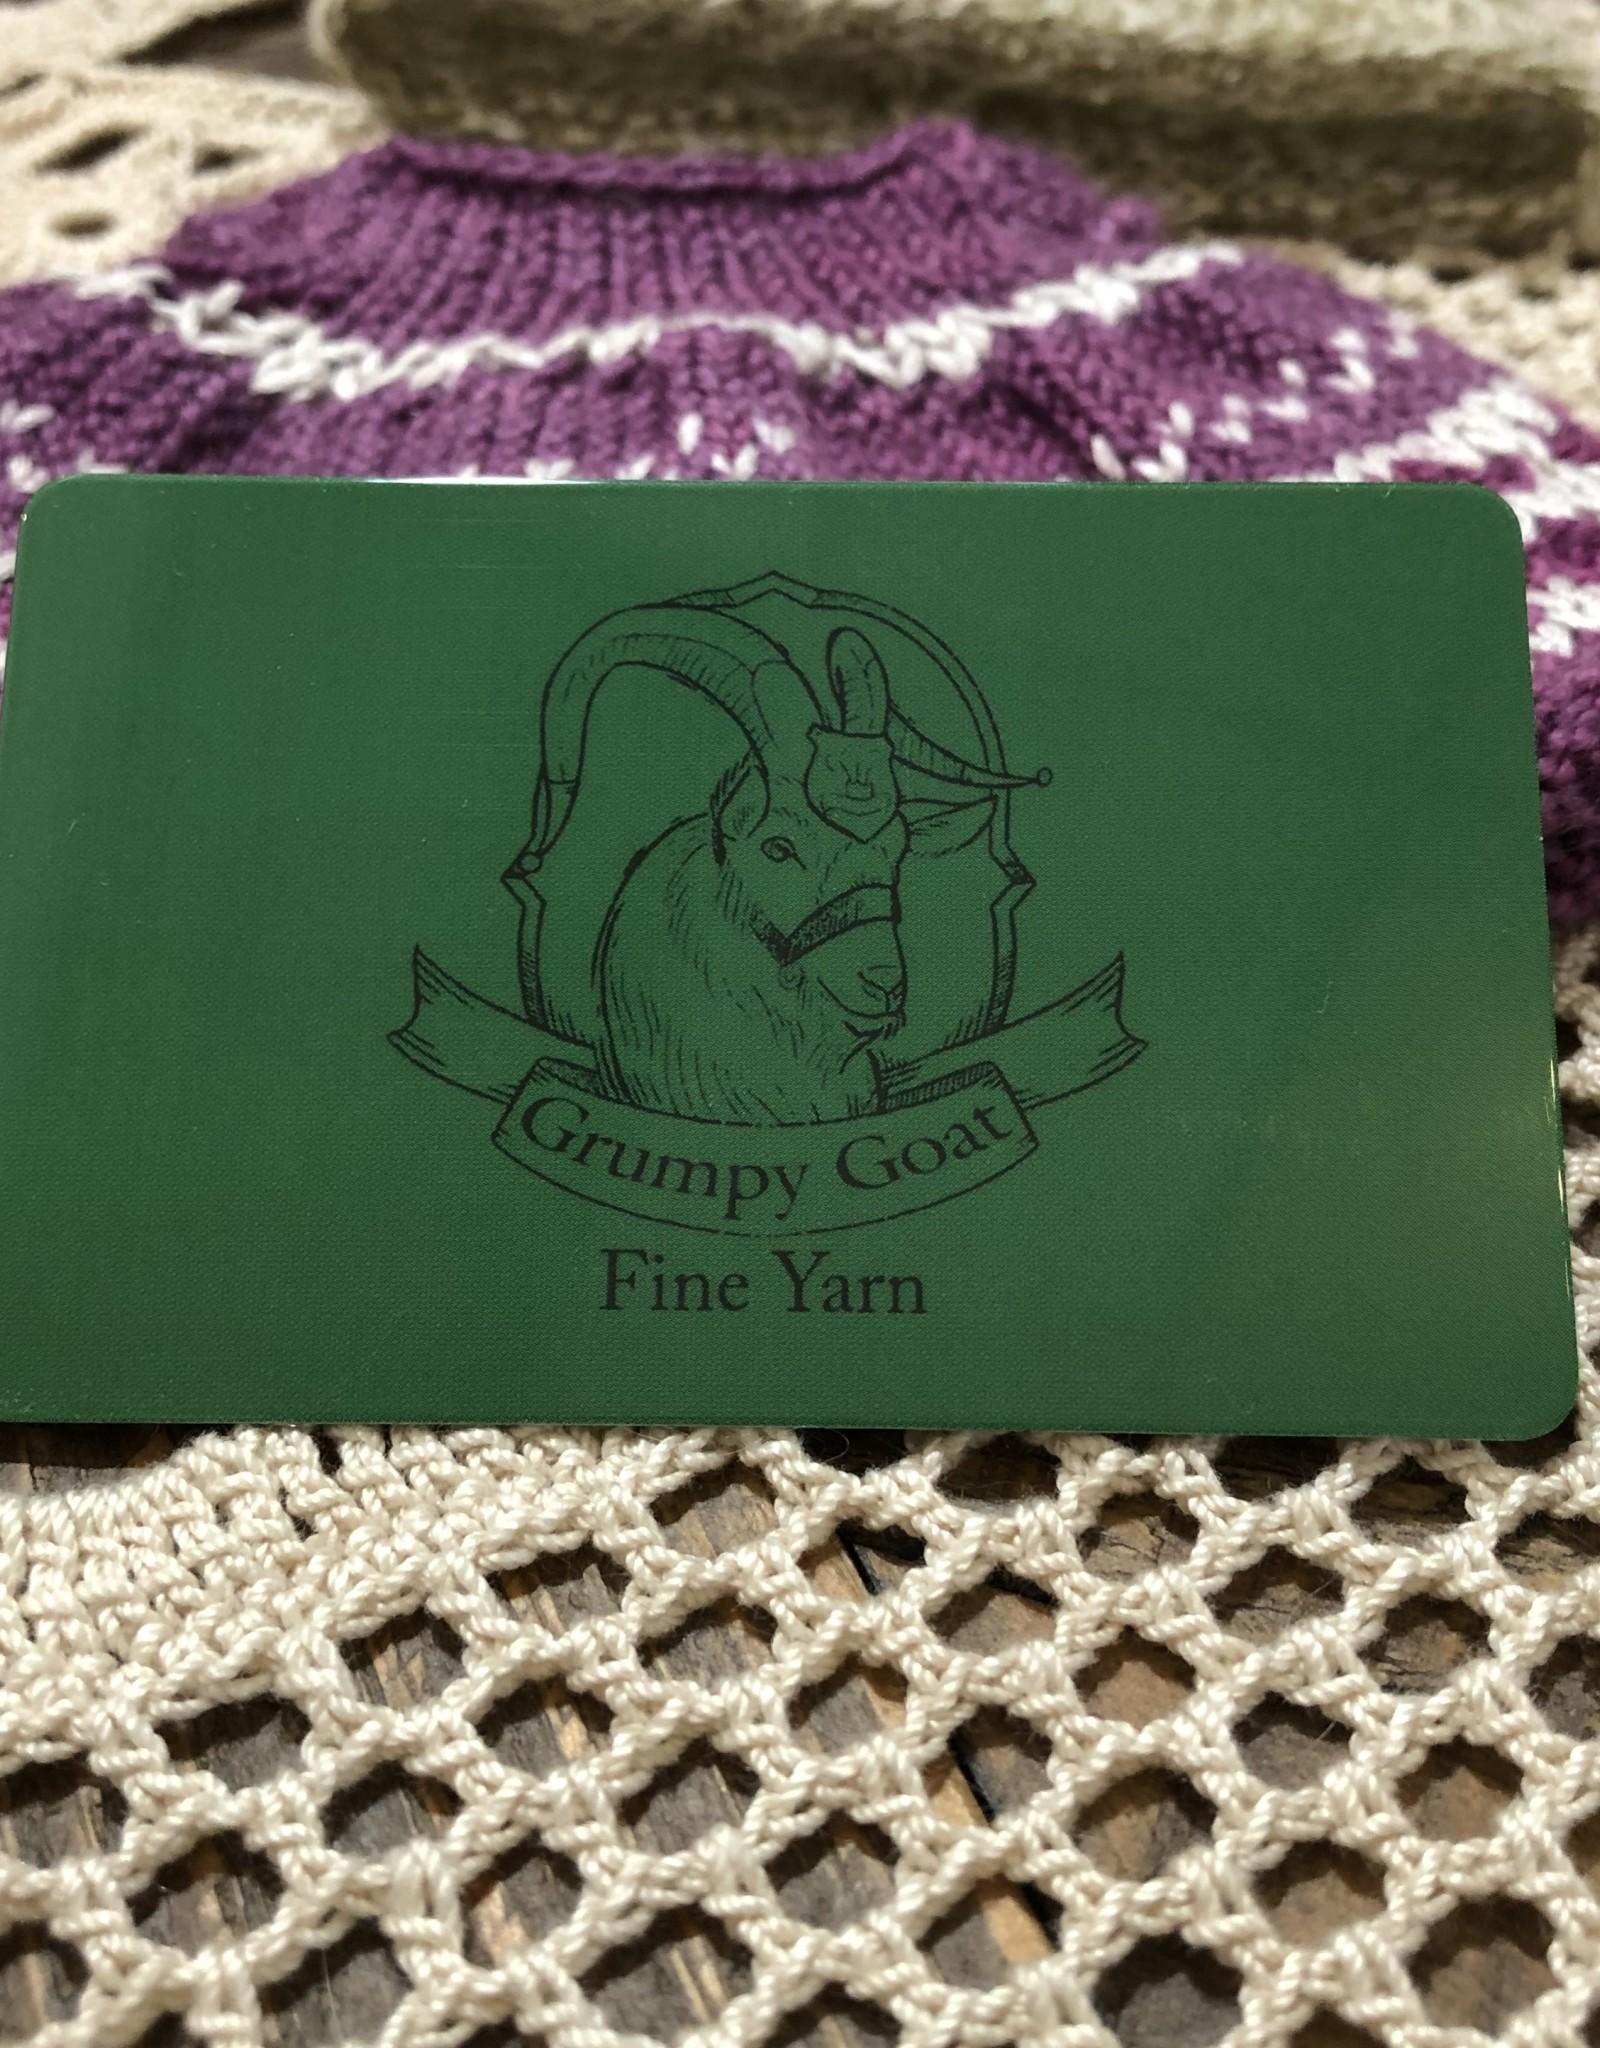 Grumpy Goat Gift Card